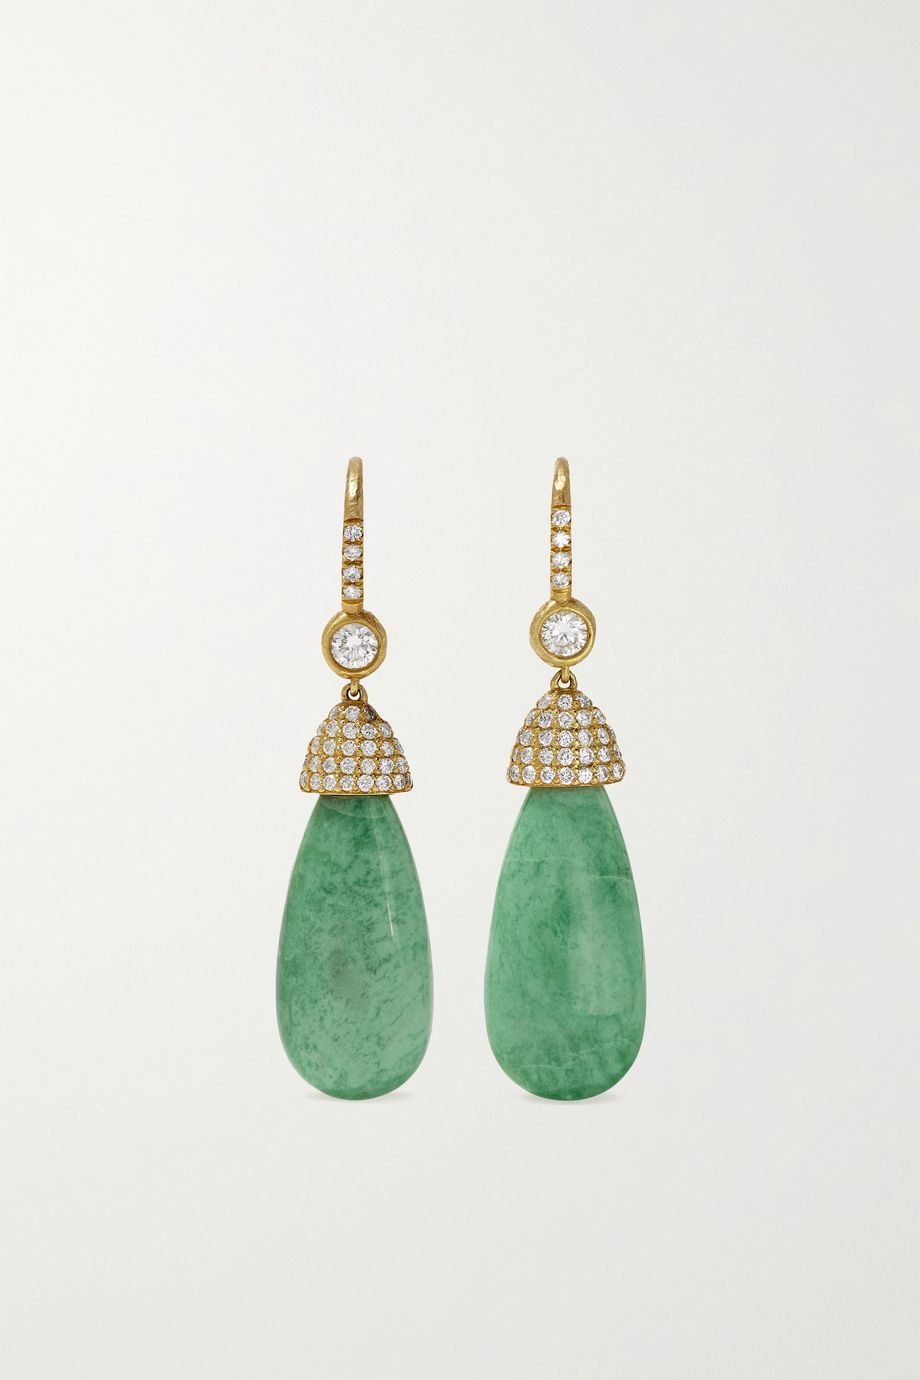 Octavia Elizabeth + NET SUSTAIN 18-karat recycled gold, variscite and diamond earrings